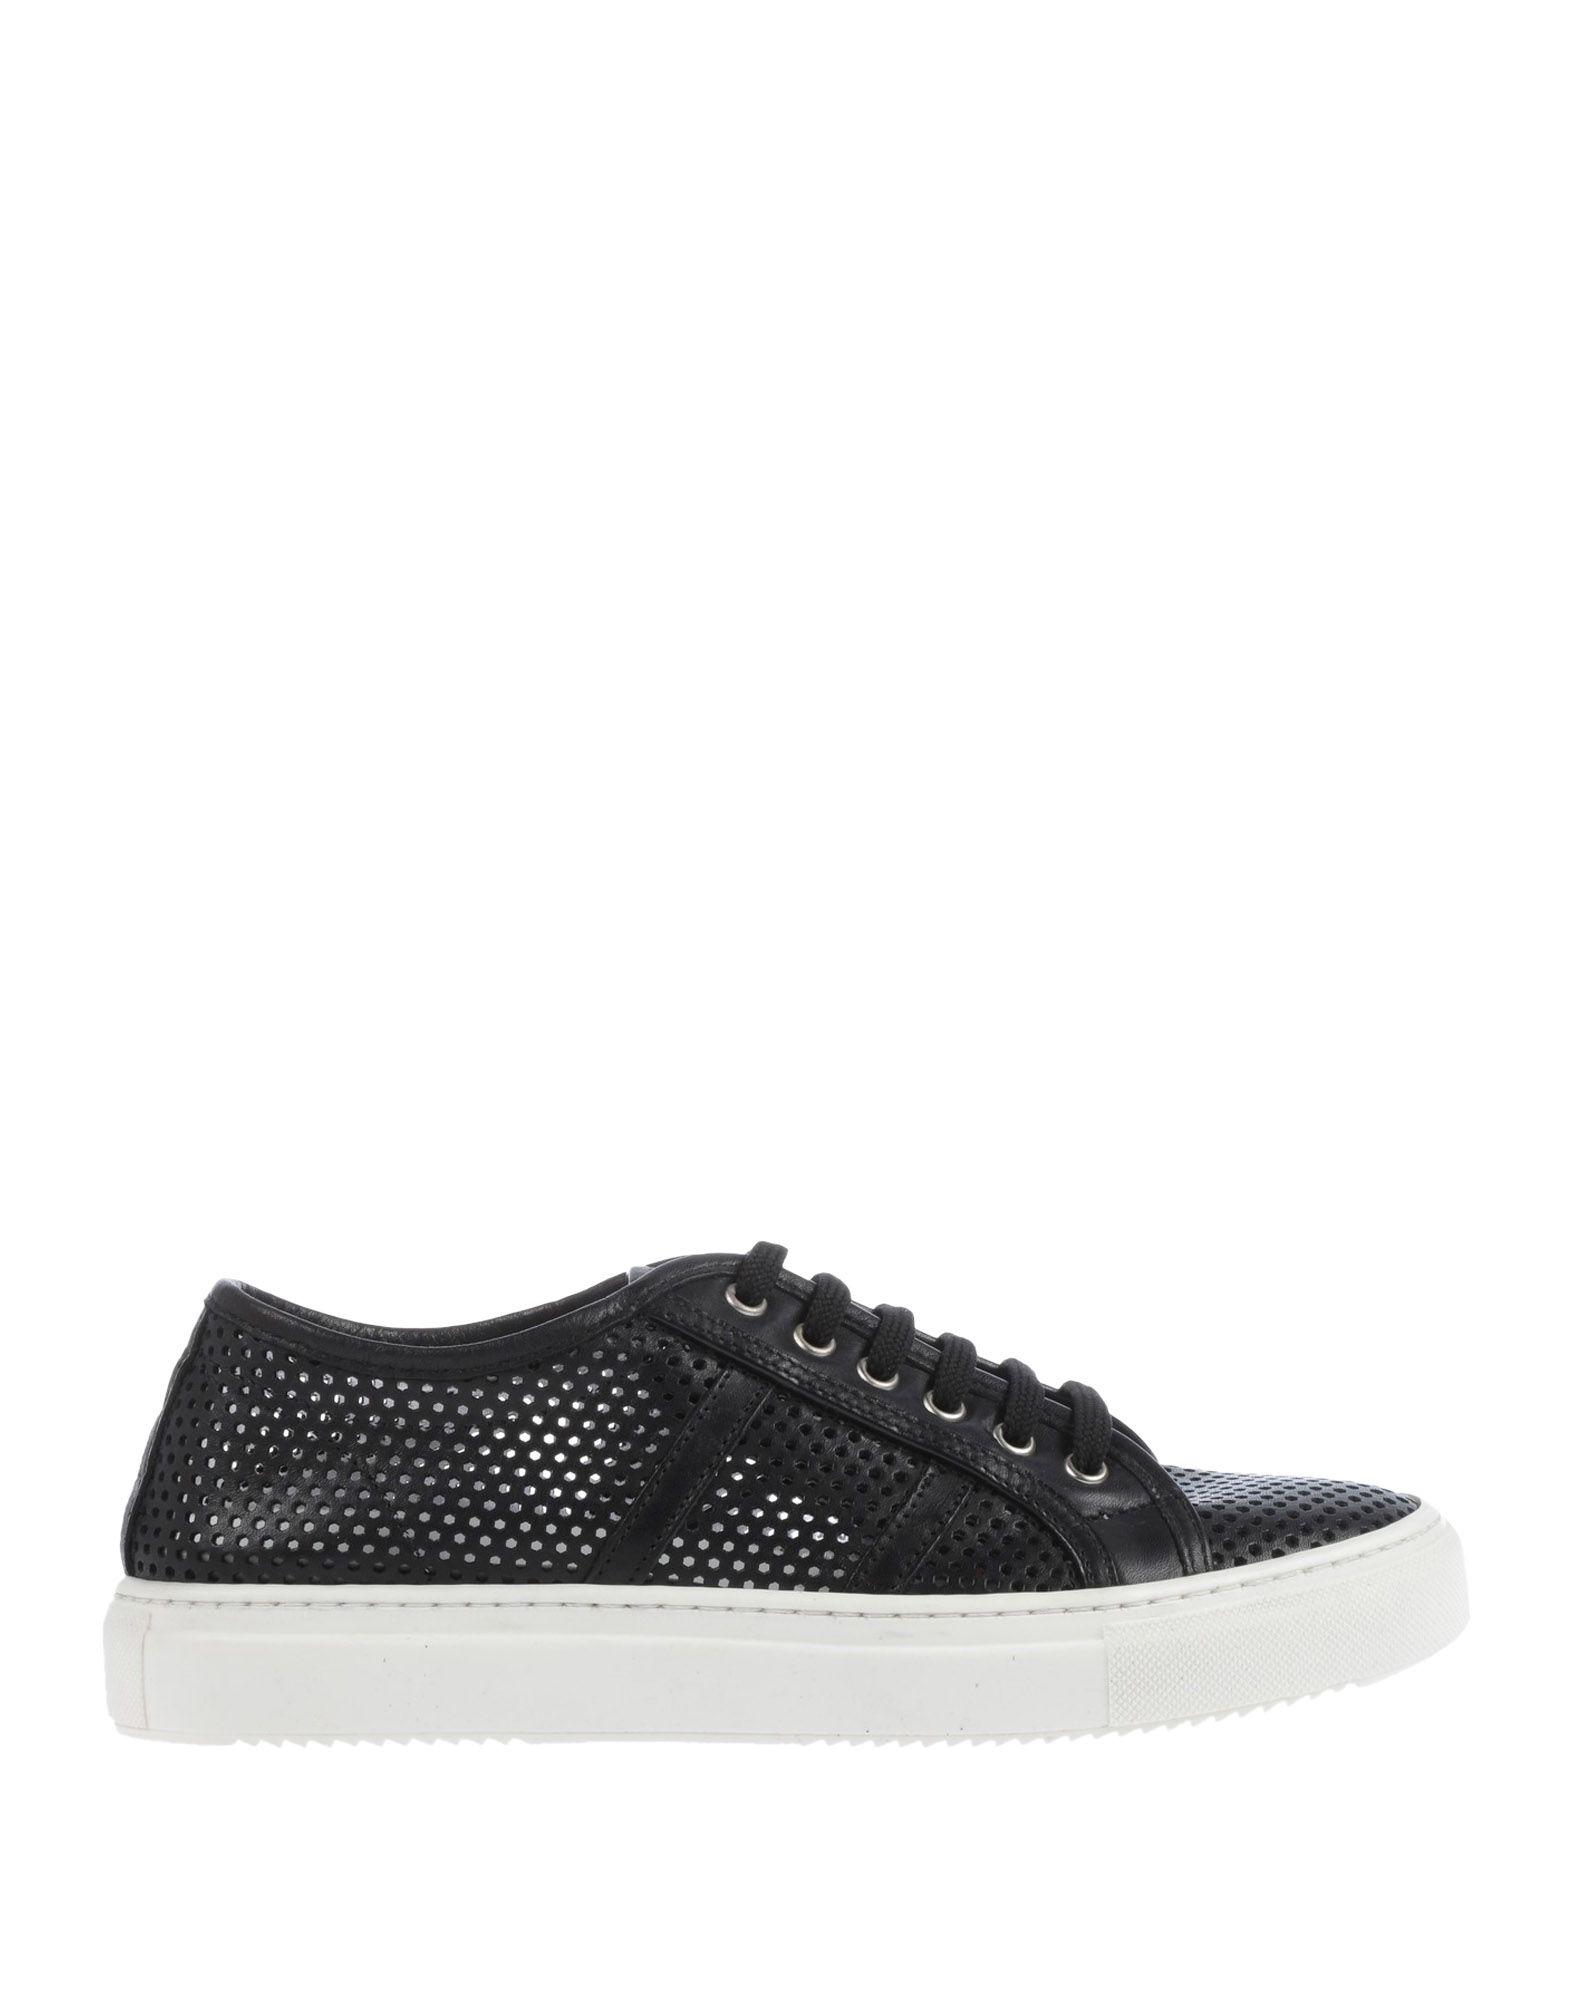 Rabatt echte Schuhe Daniele Alessandrini Homme Sneakers Herren  11416844EB